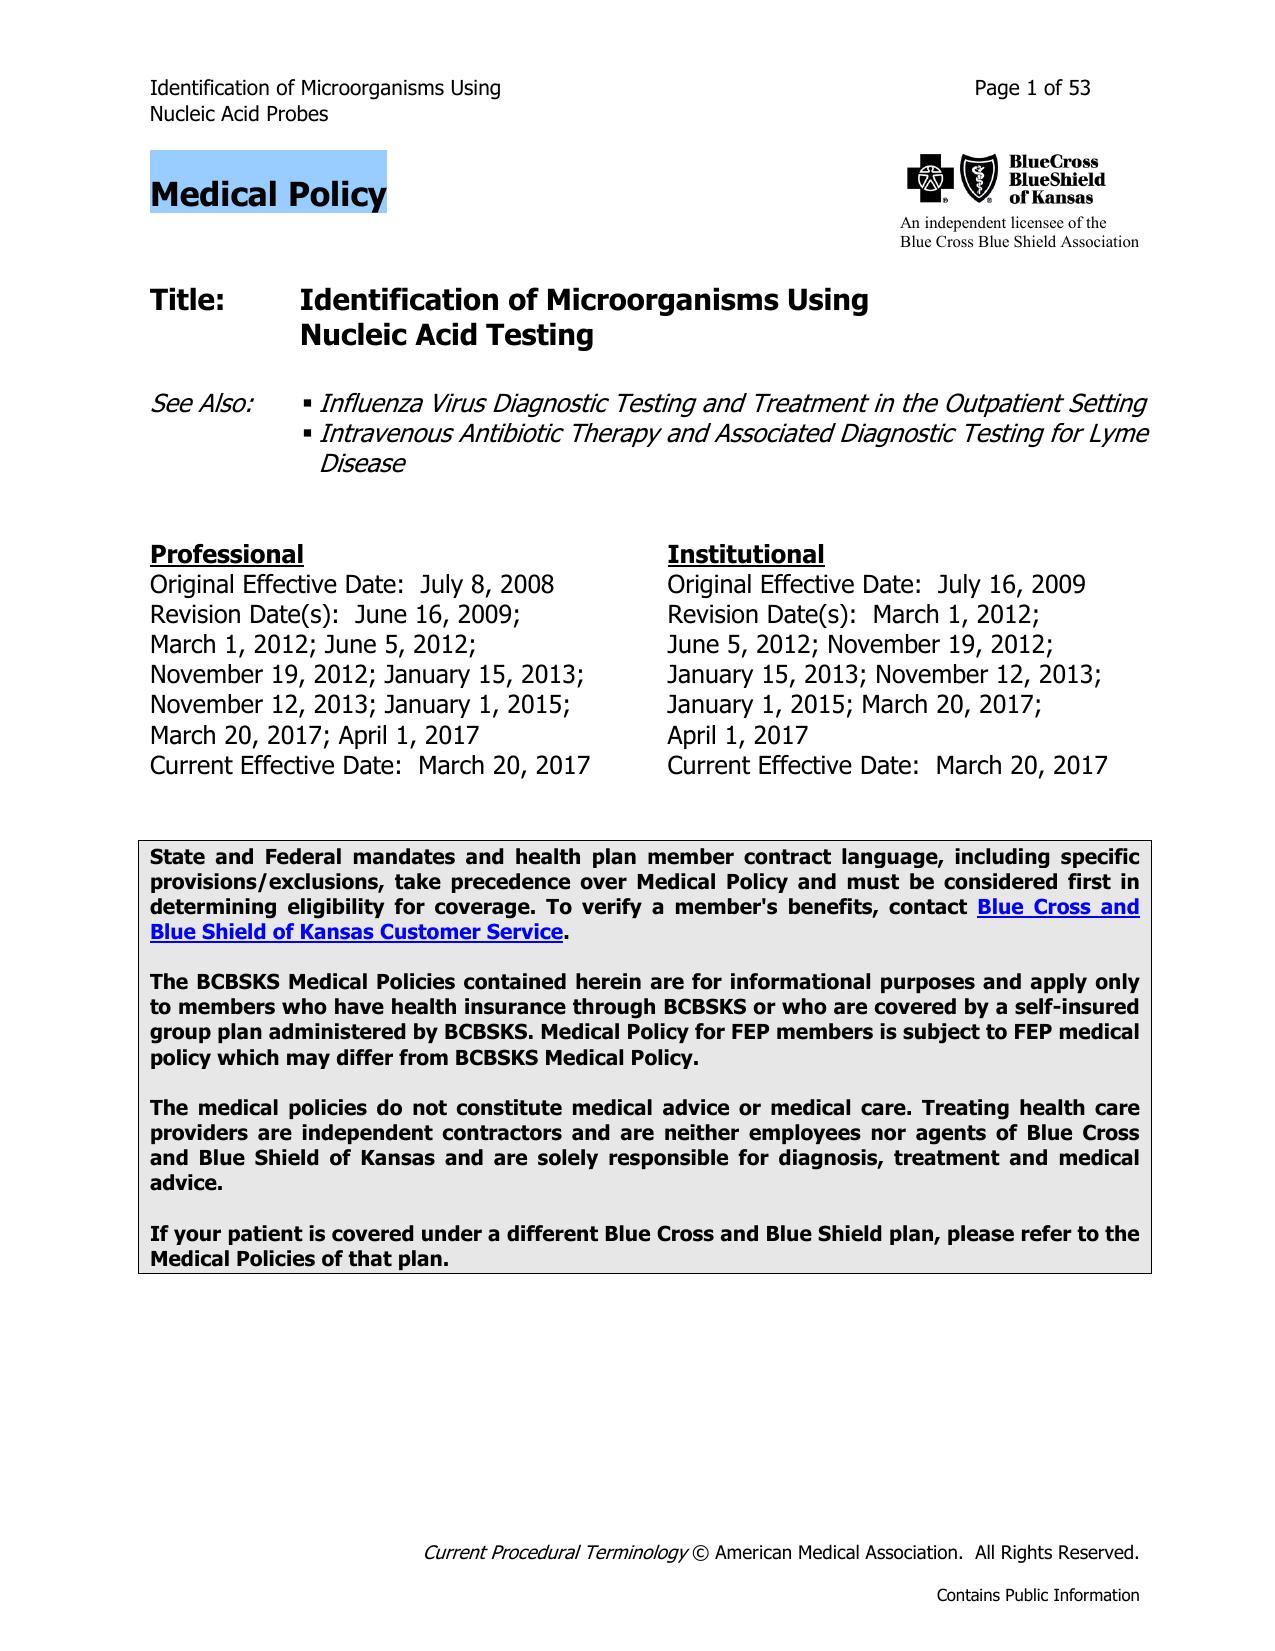 Identification of Microorganisms Using Nucleic Acid Testing